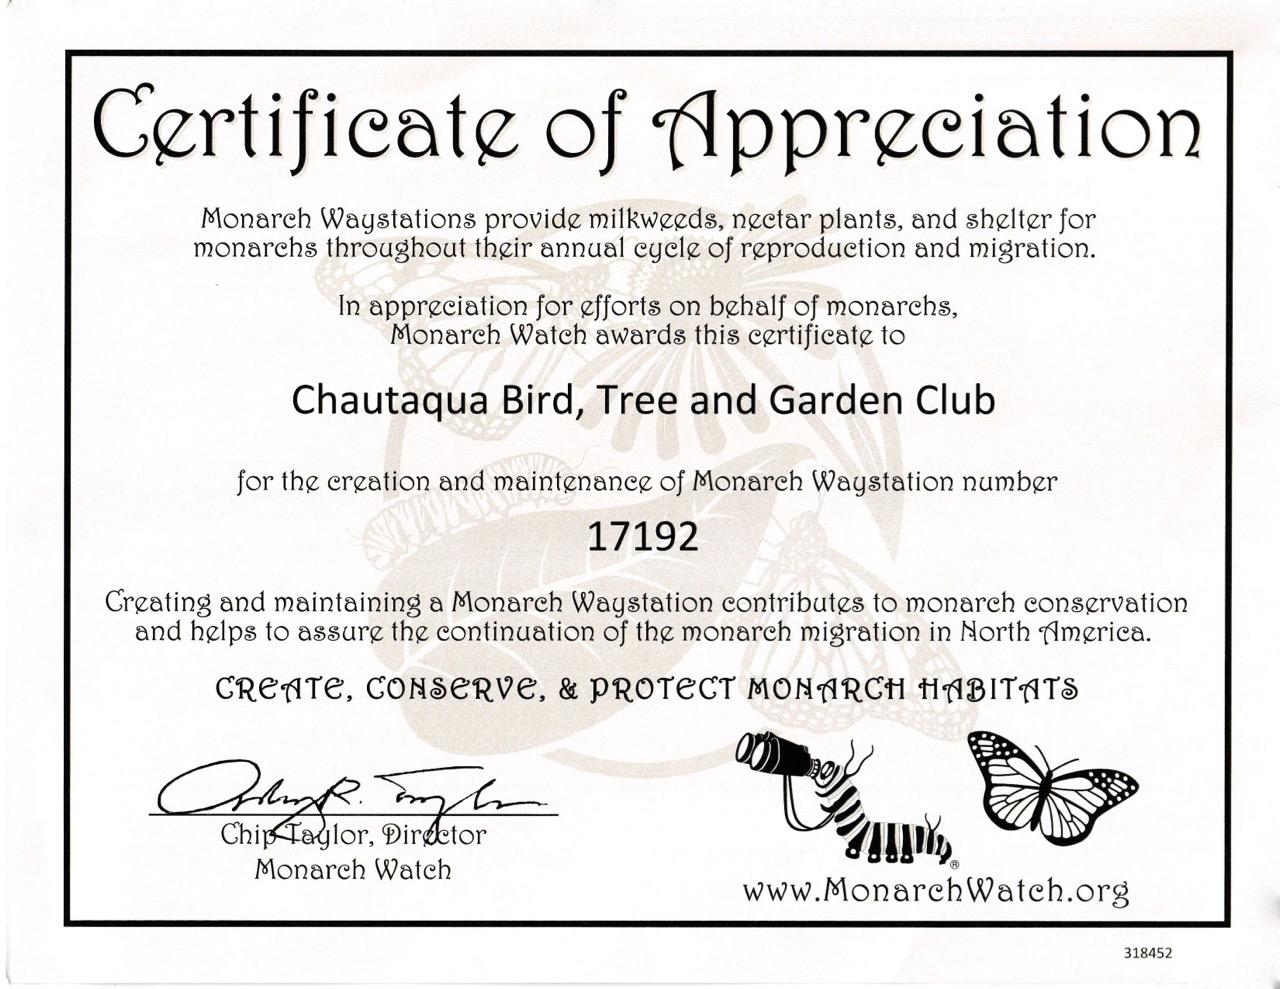 Certified gardens receive a 'certificate of appreciation' from Monarch Watch